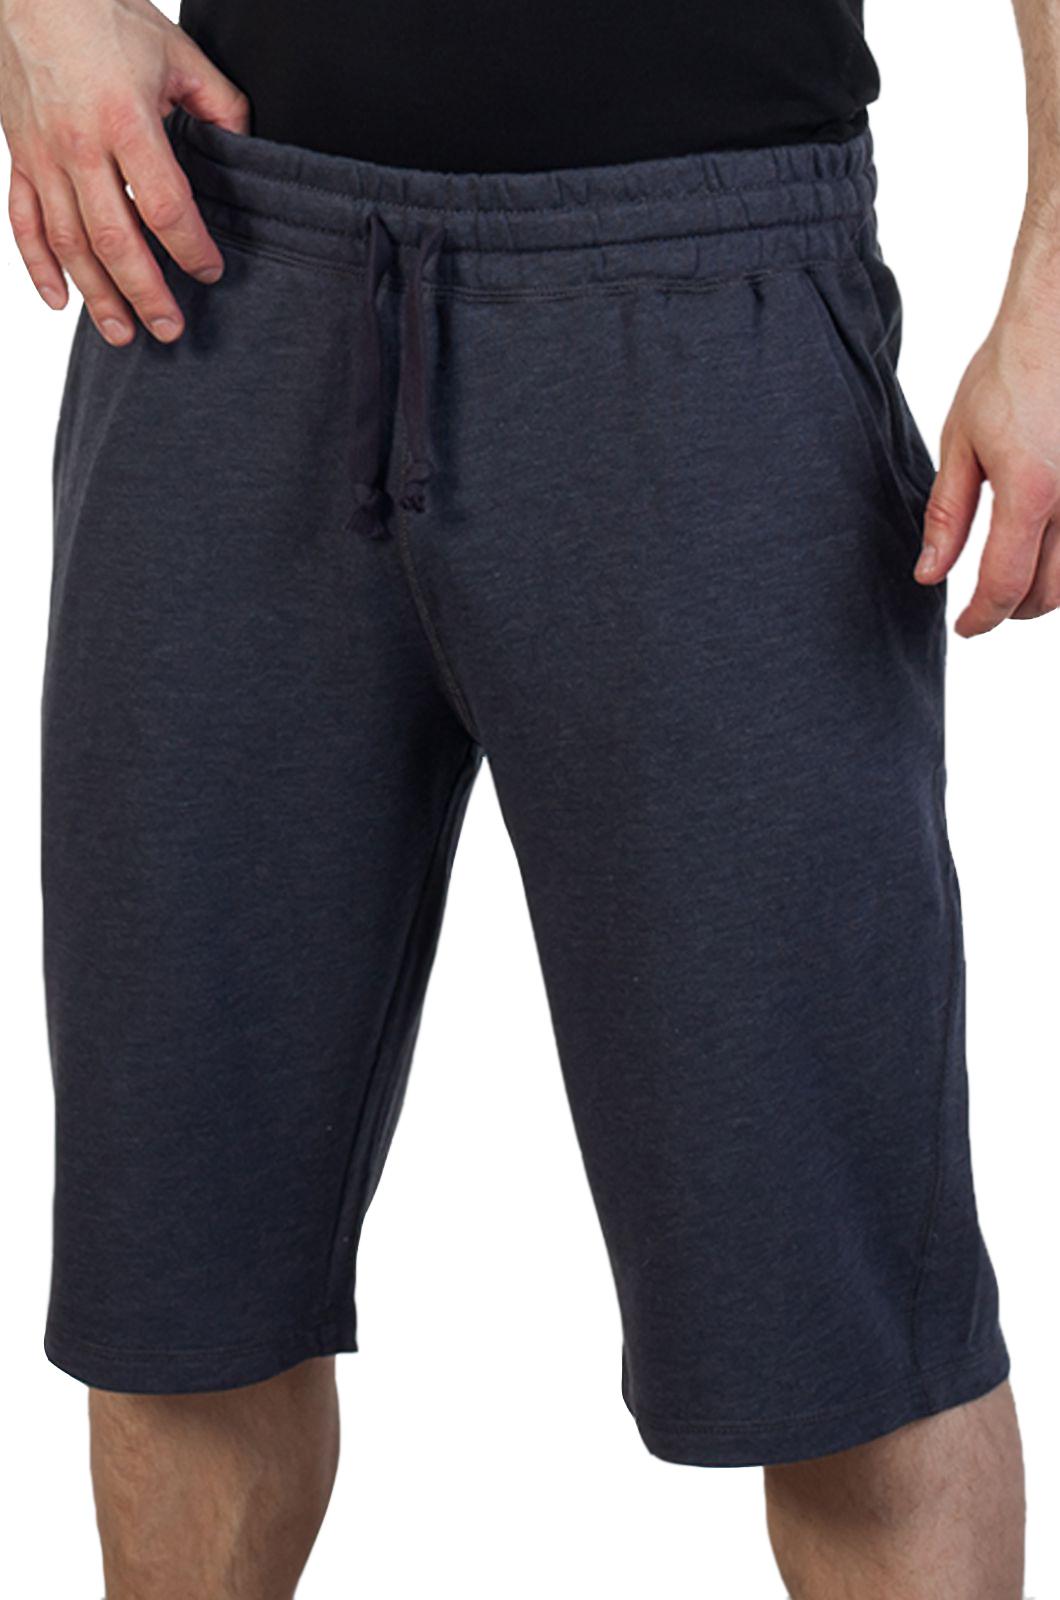 Спортивные шорты для мужчин от бренда French Onion